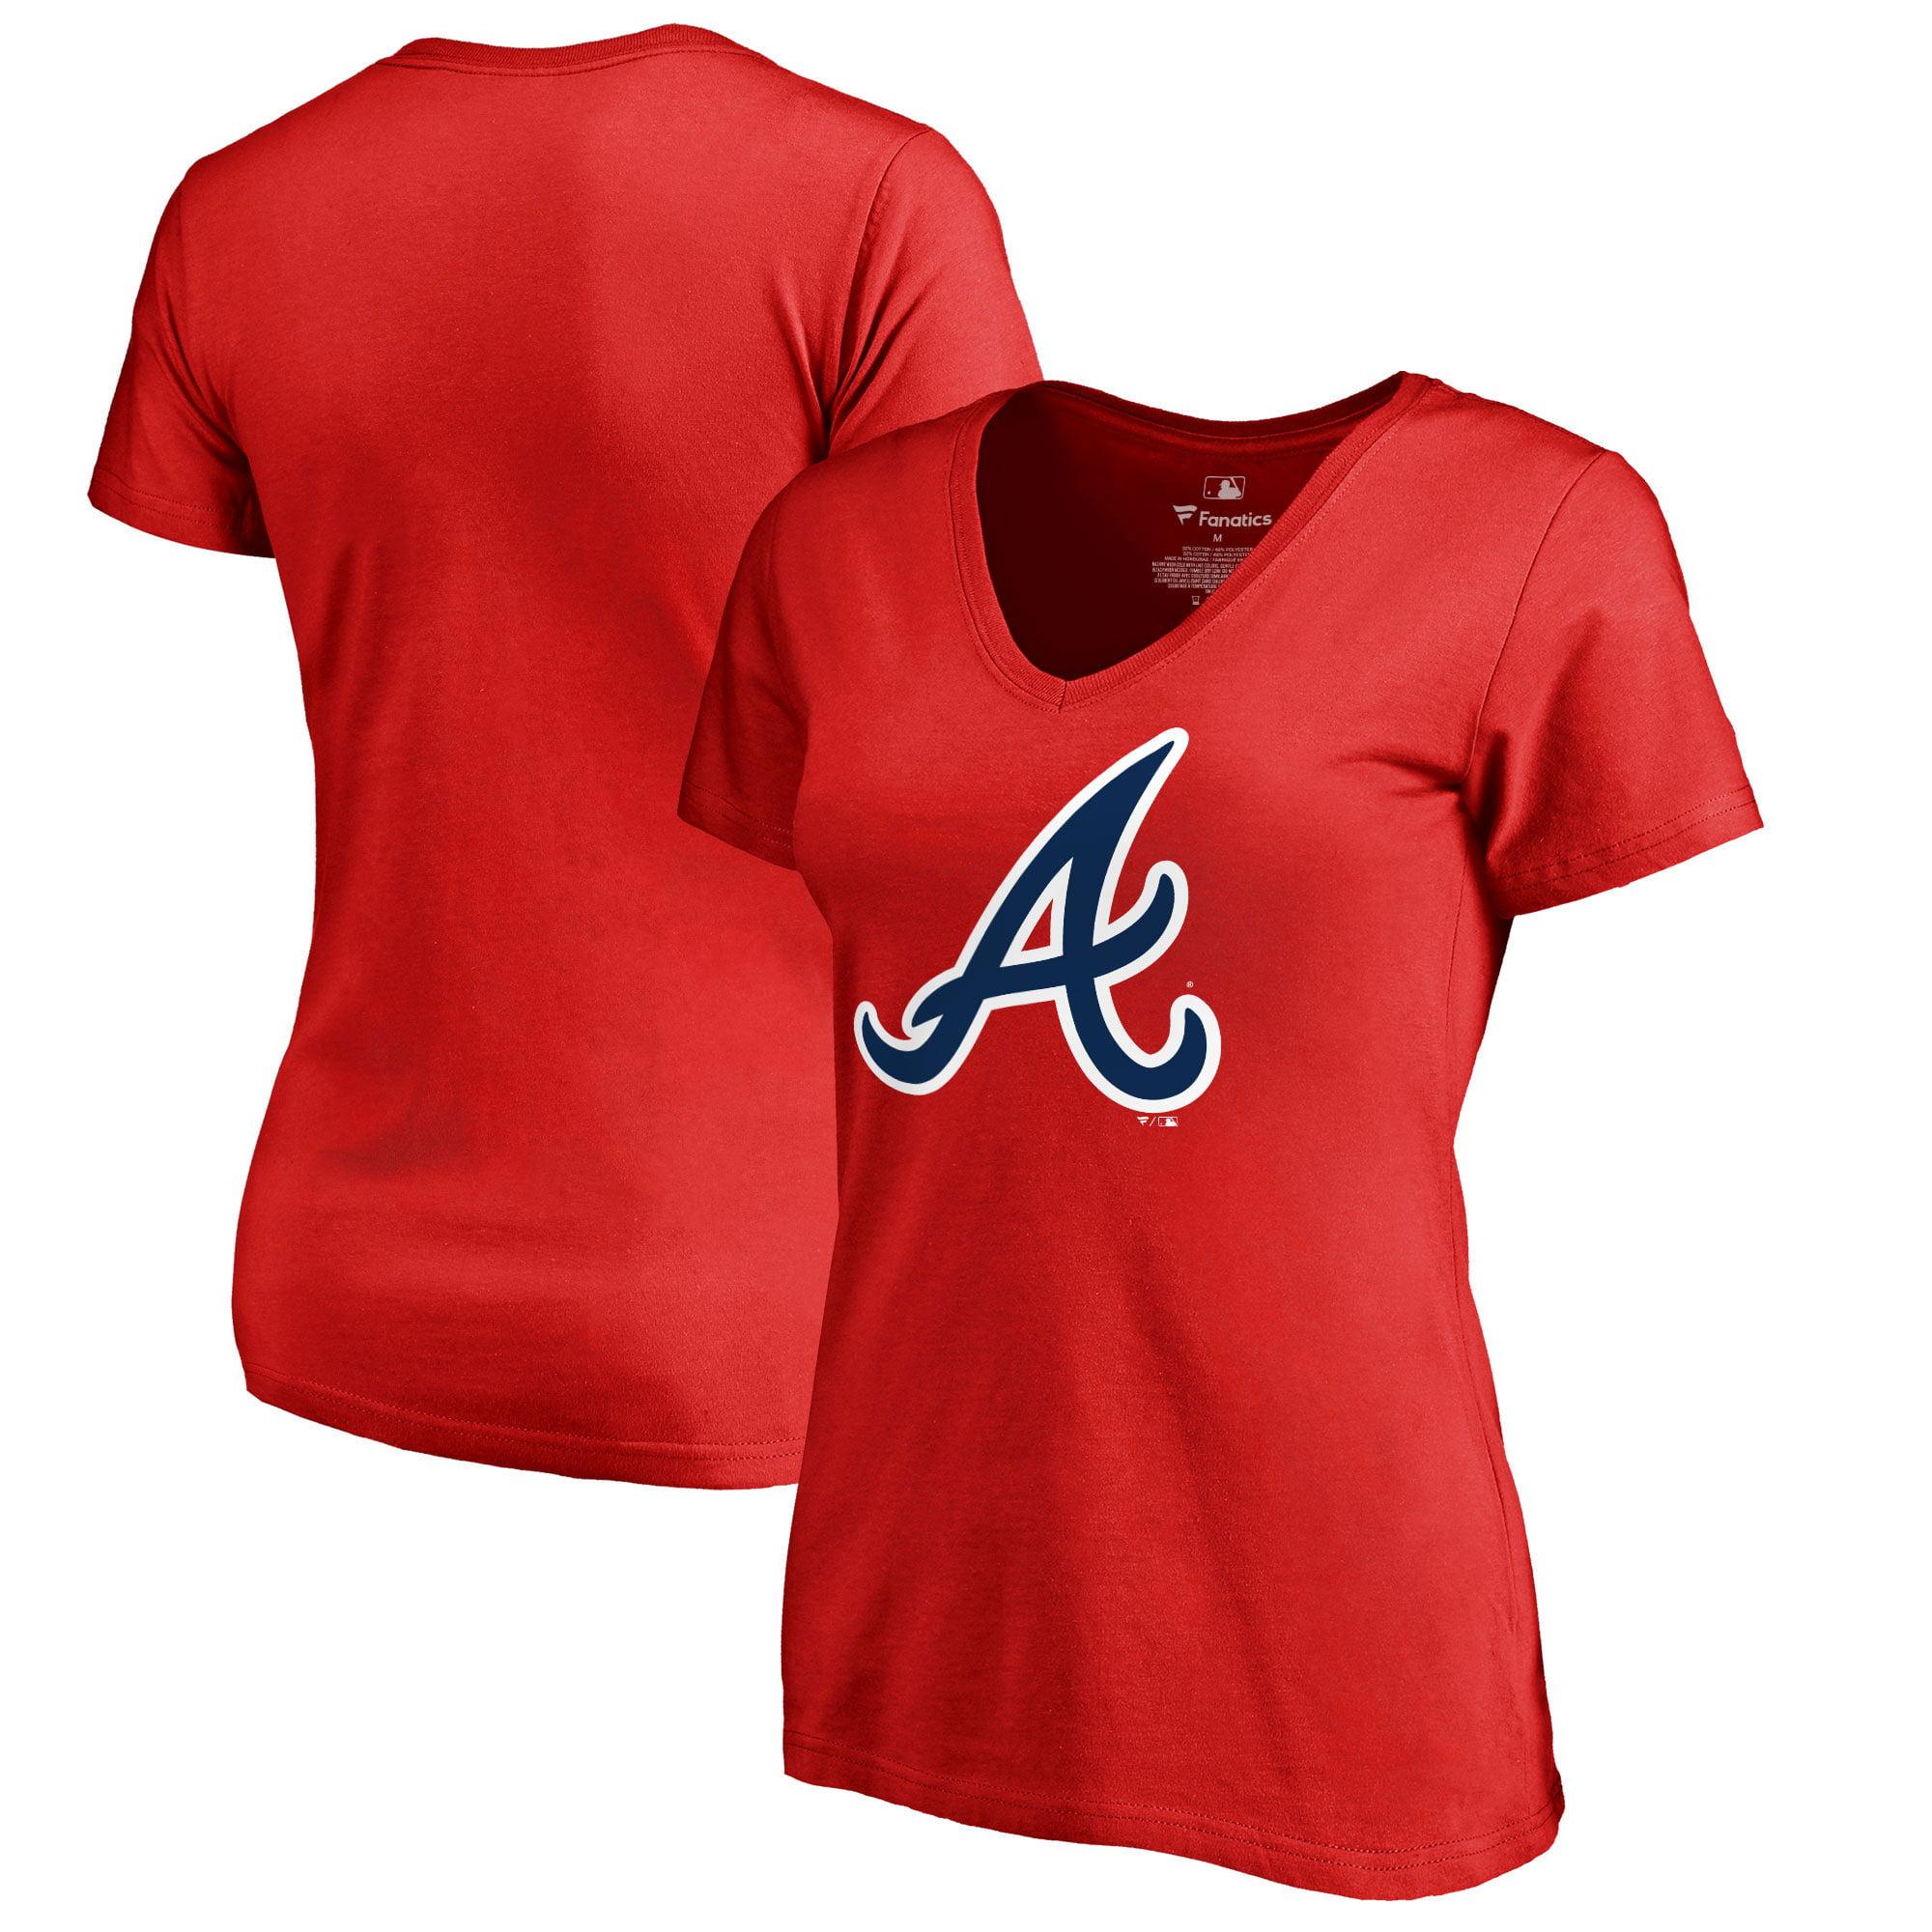 Atlanta Braves Fanatics Branded Women's Primary Logo V-Neck T-Shirt - Red